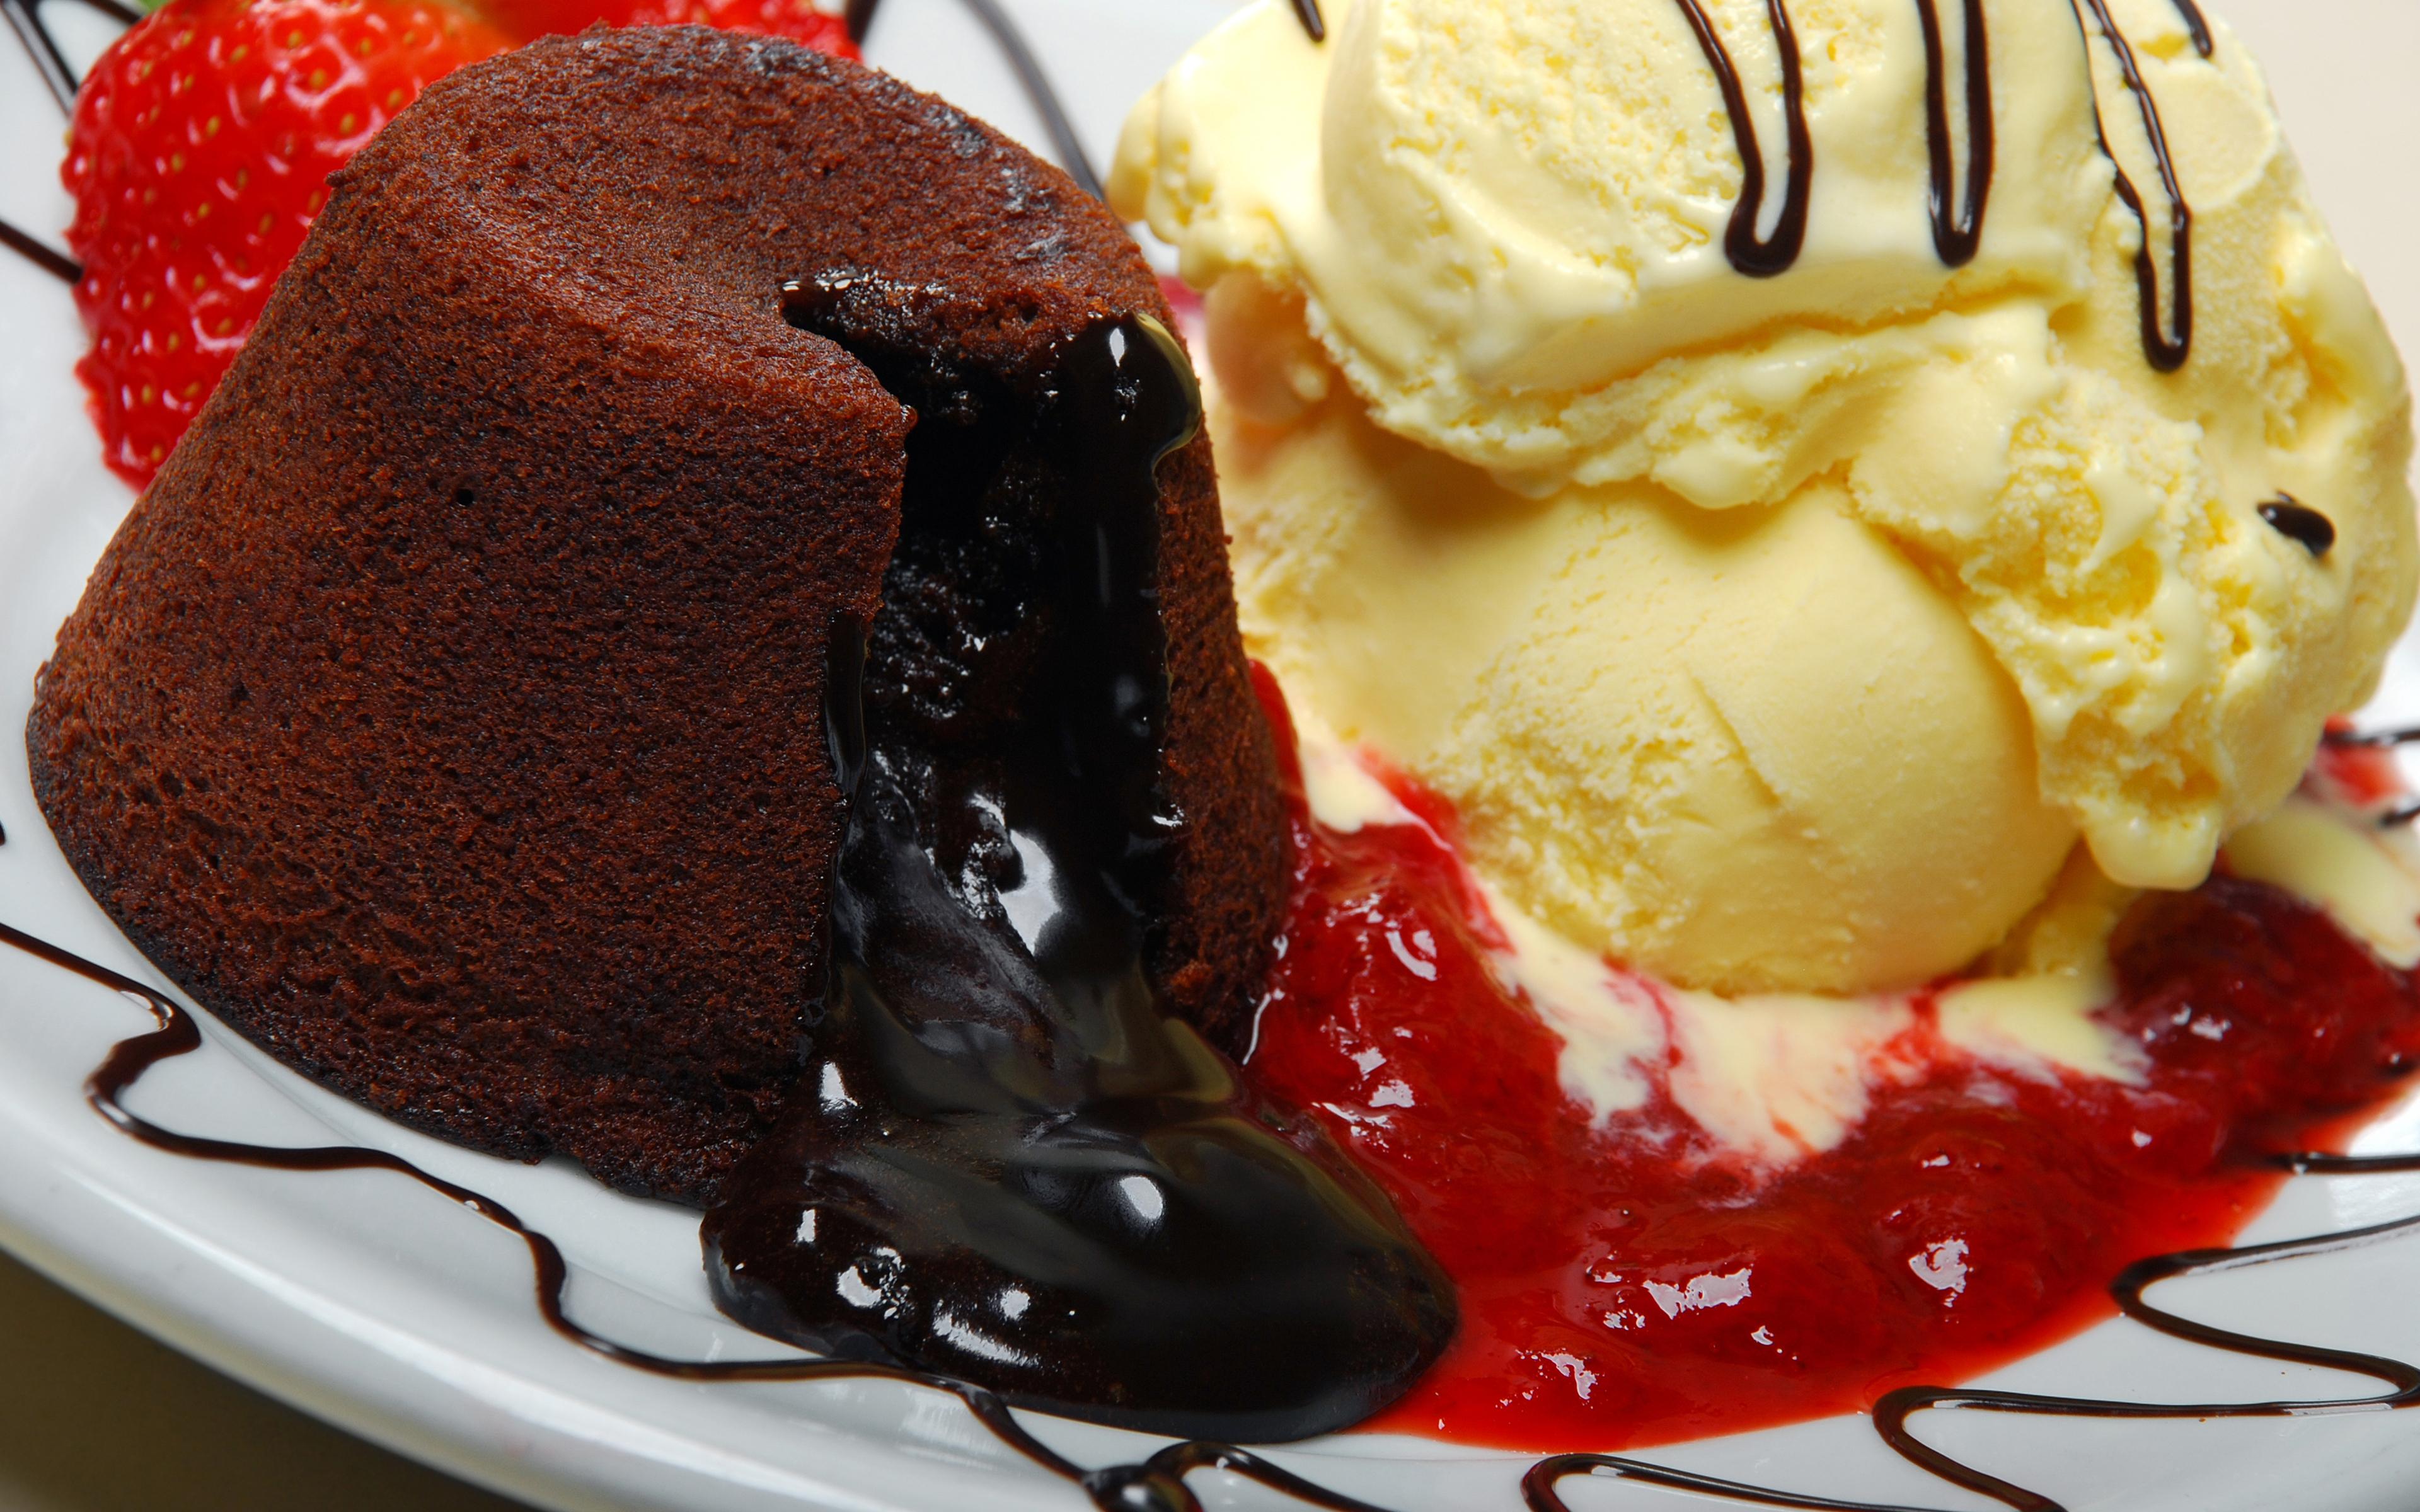 хочу пирожного хочу мороженого картинке существо